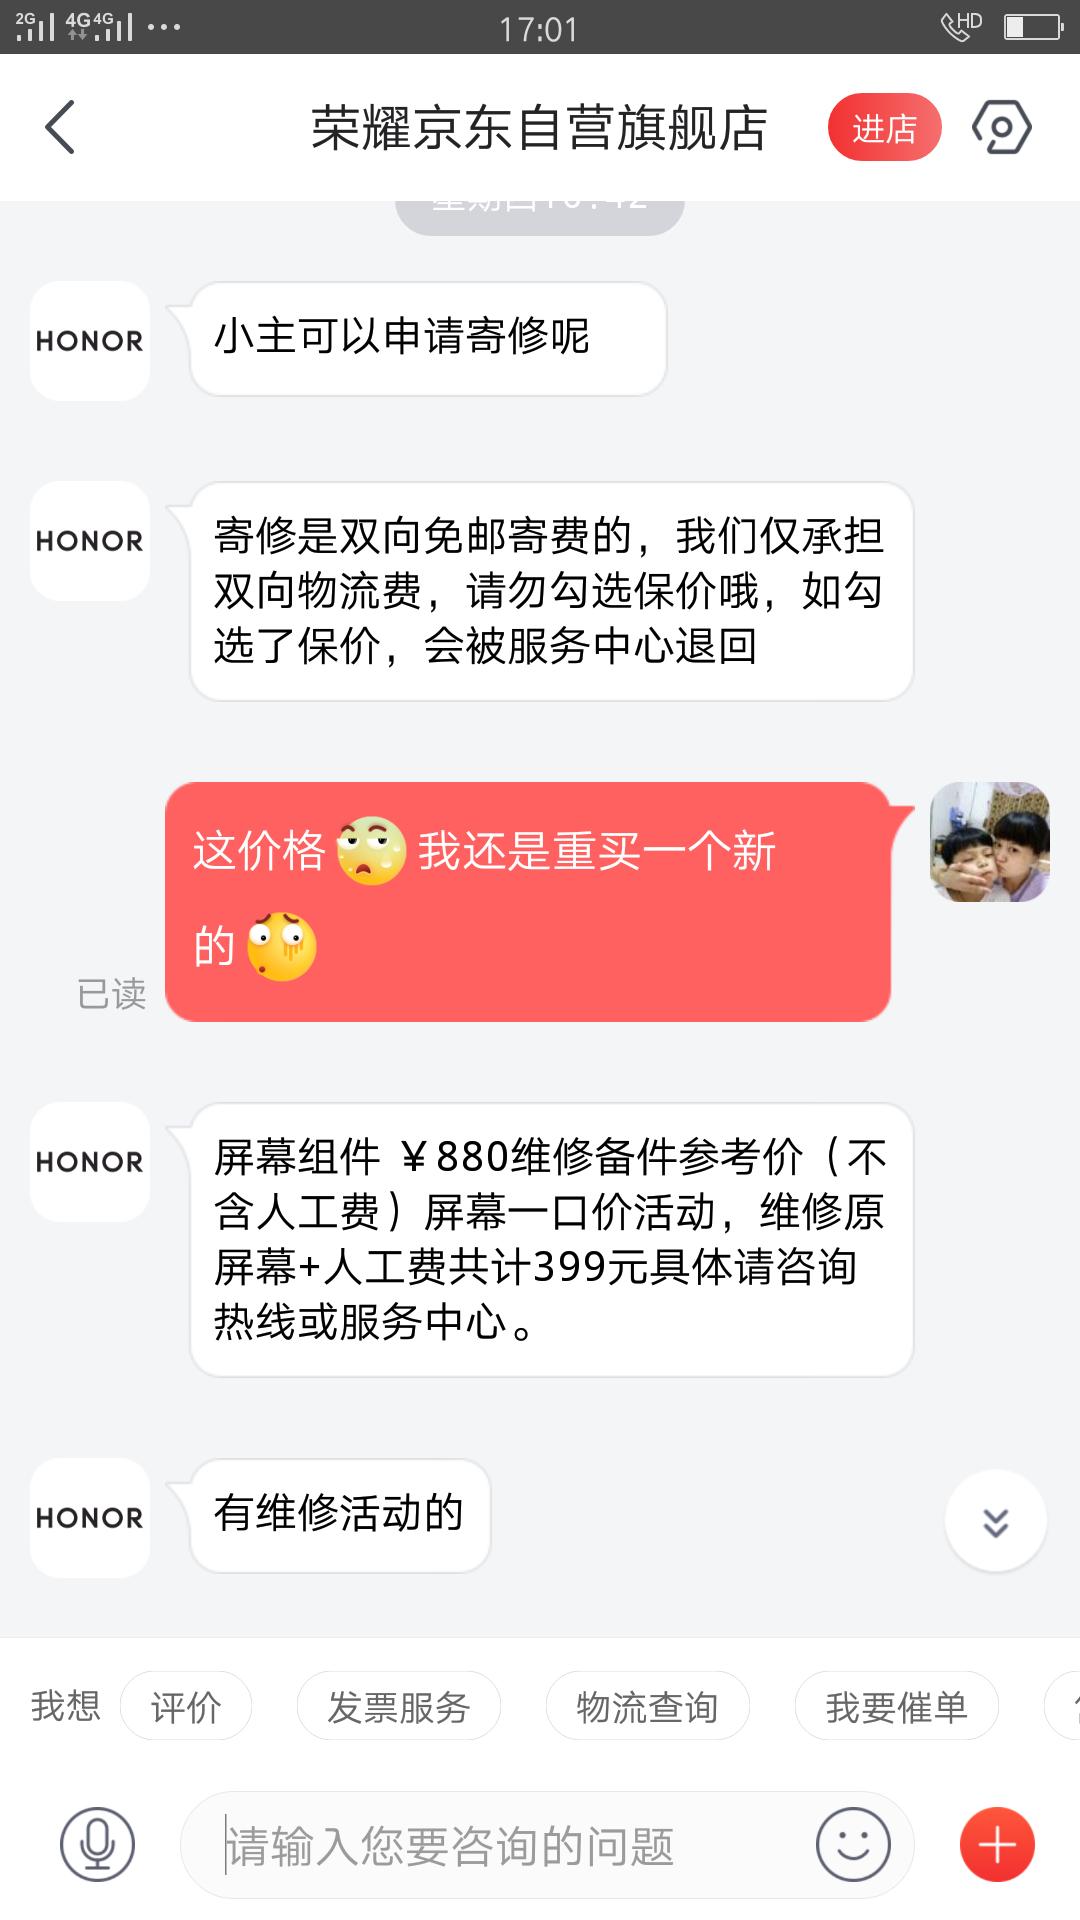 Screenshot_2019-08-24-17-01-30-18.png